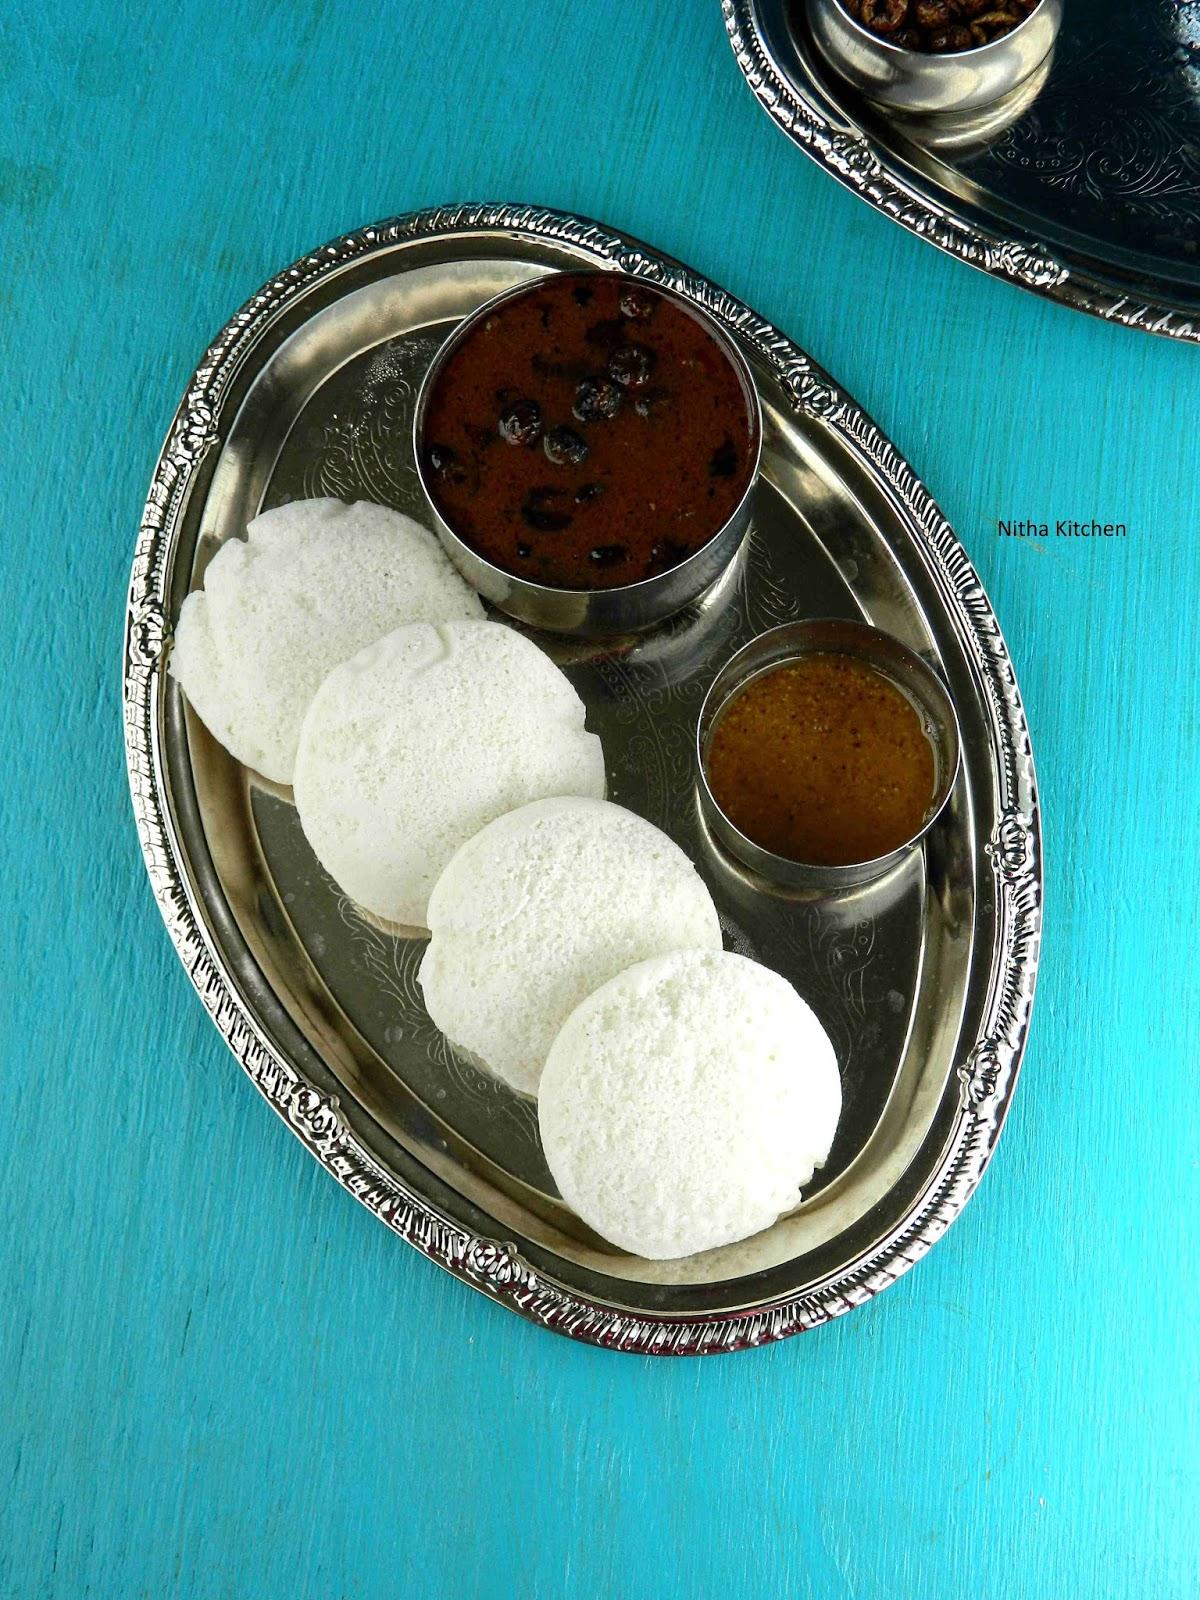 Idli Dosa Batter Mixer Version | South Indian Kitchen Basics - Nitha ...